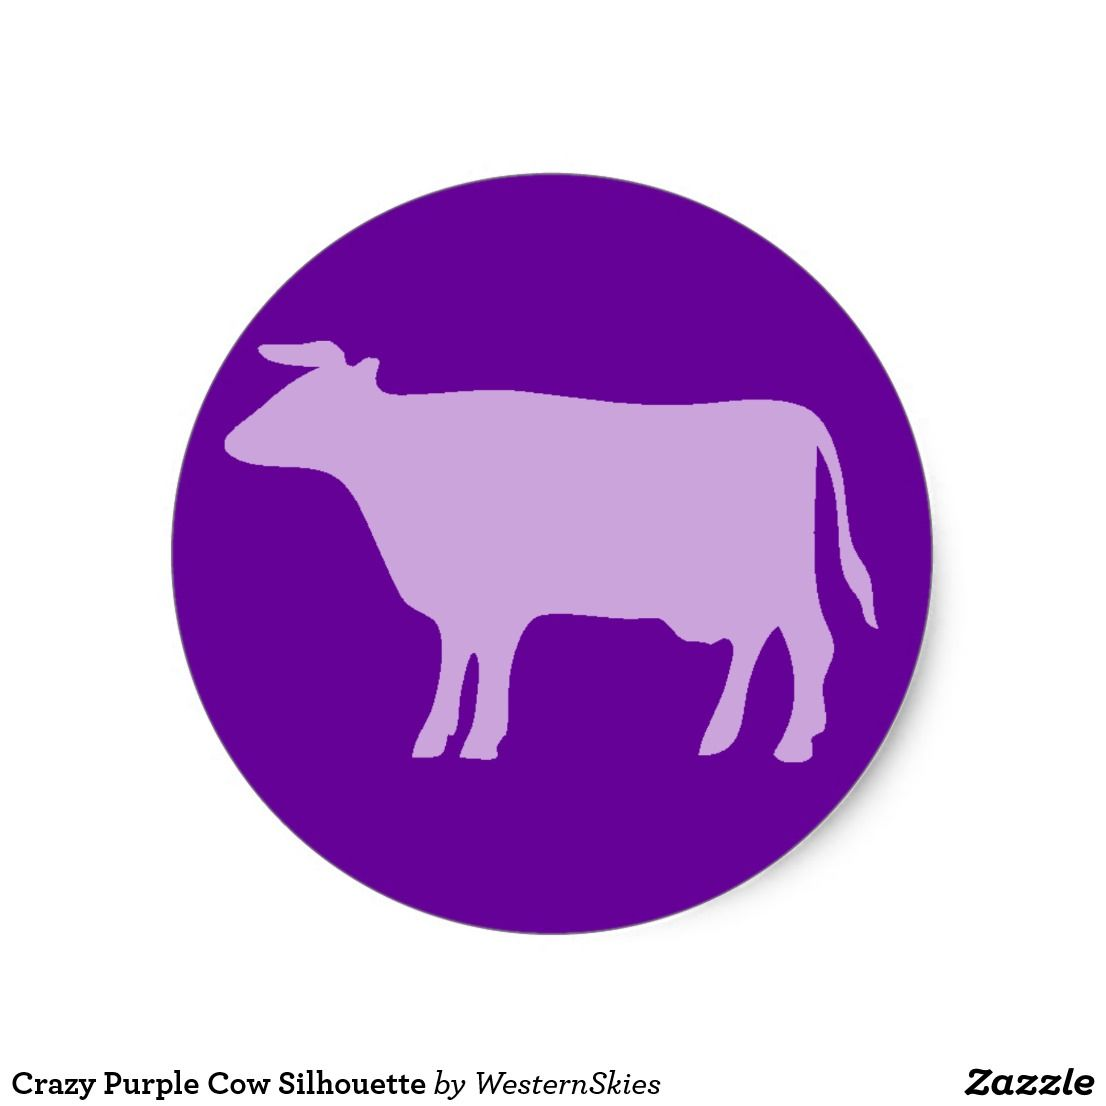 Crazy Purple Cow Silhouette Classic Round Sticker Zazzle Com Purple Cow Cow Round Stickers